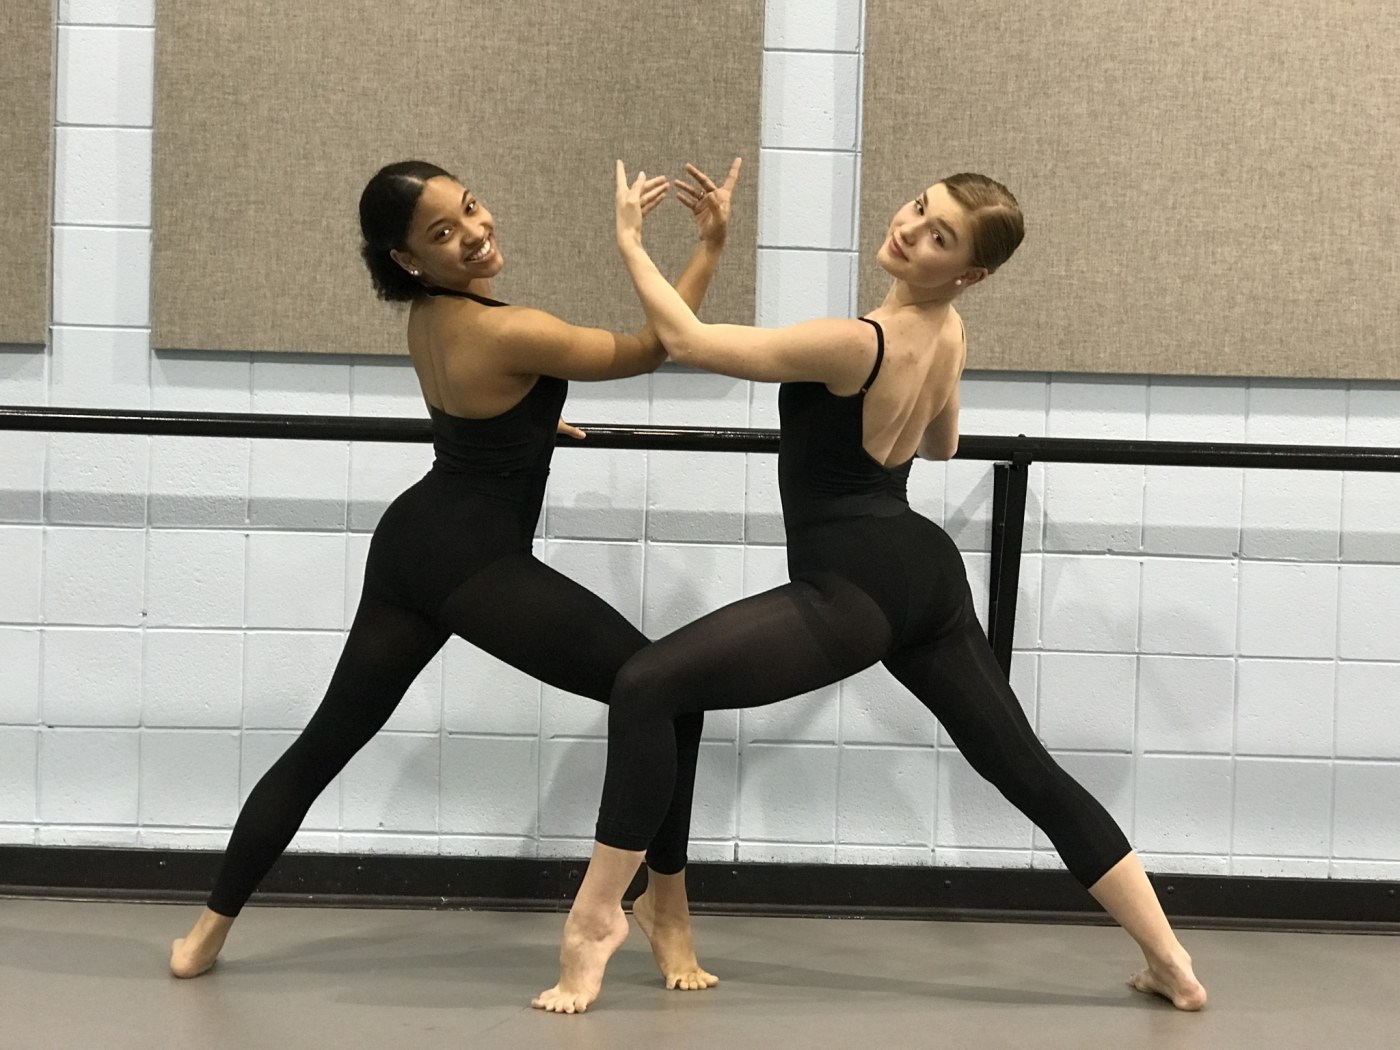 Birmingham, Alabama School of Fine Arts, Juilliard, dance, ballet